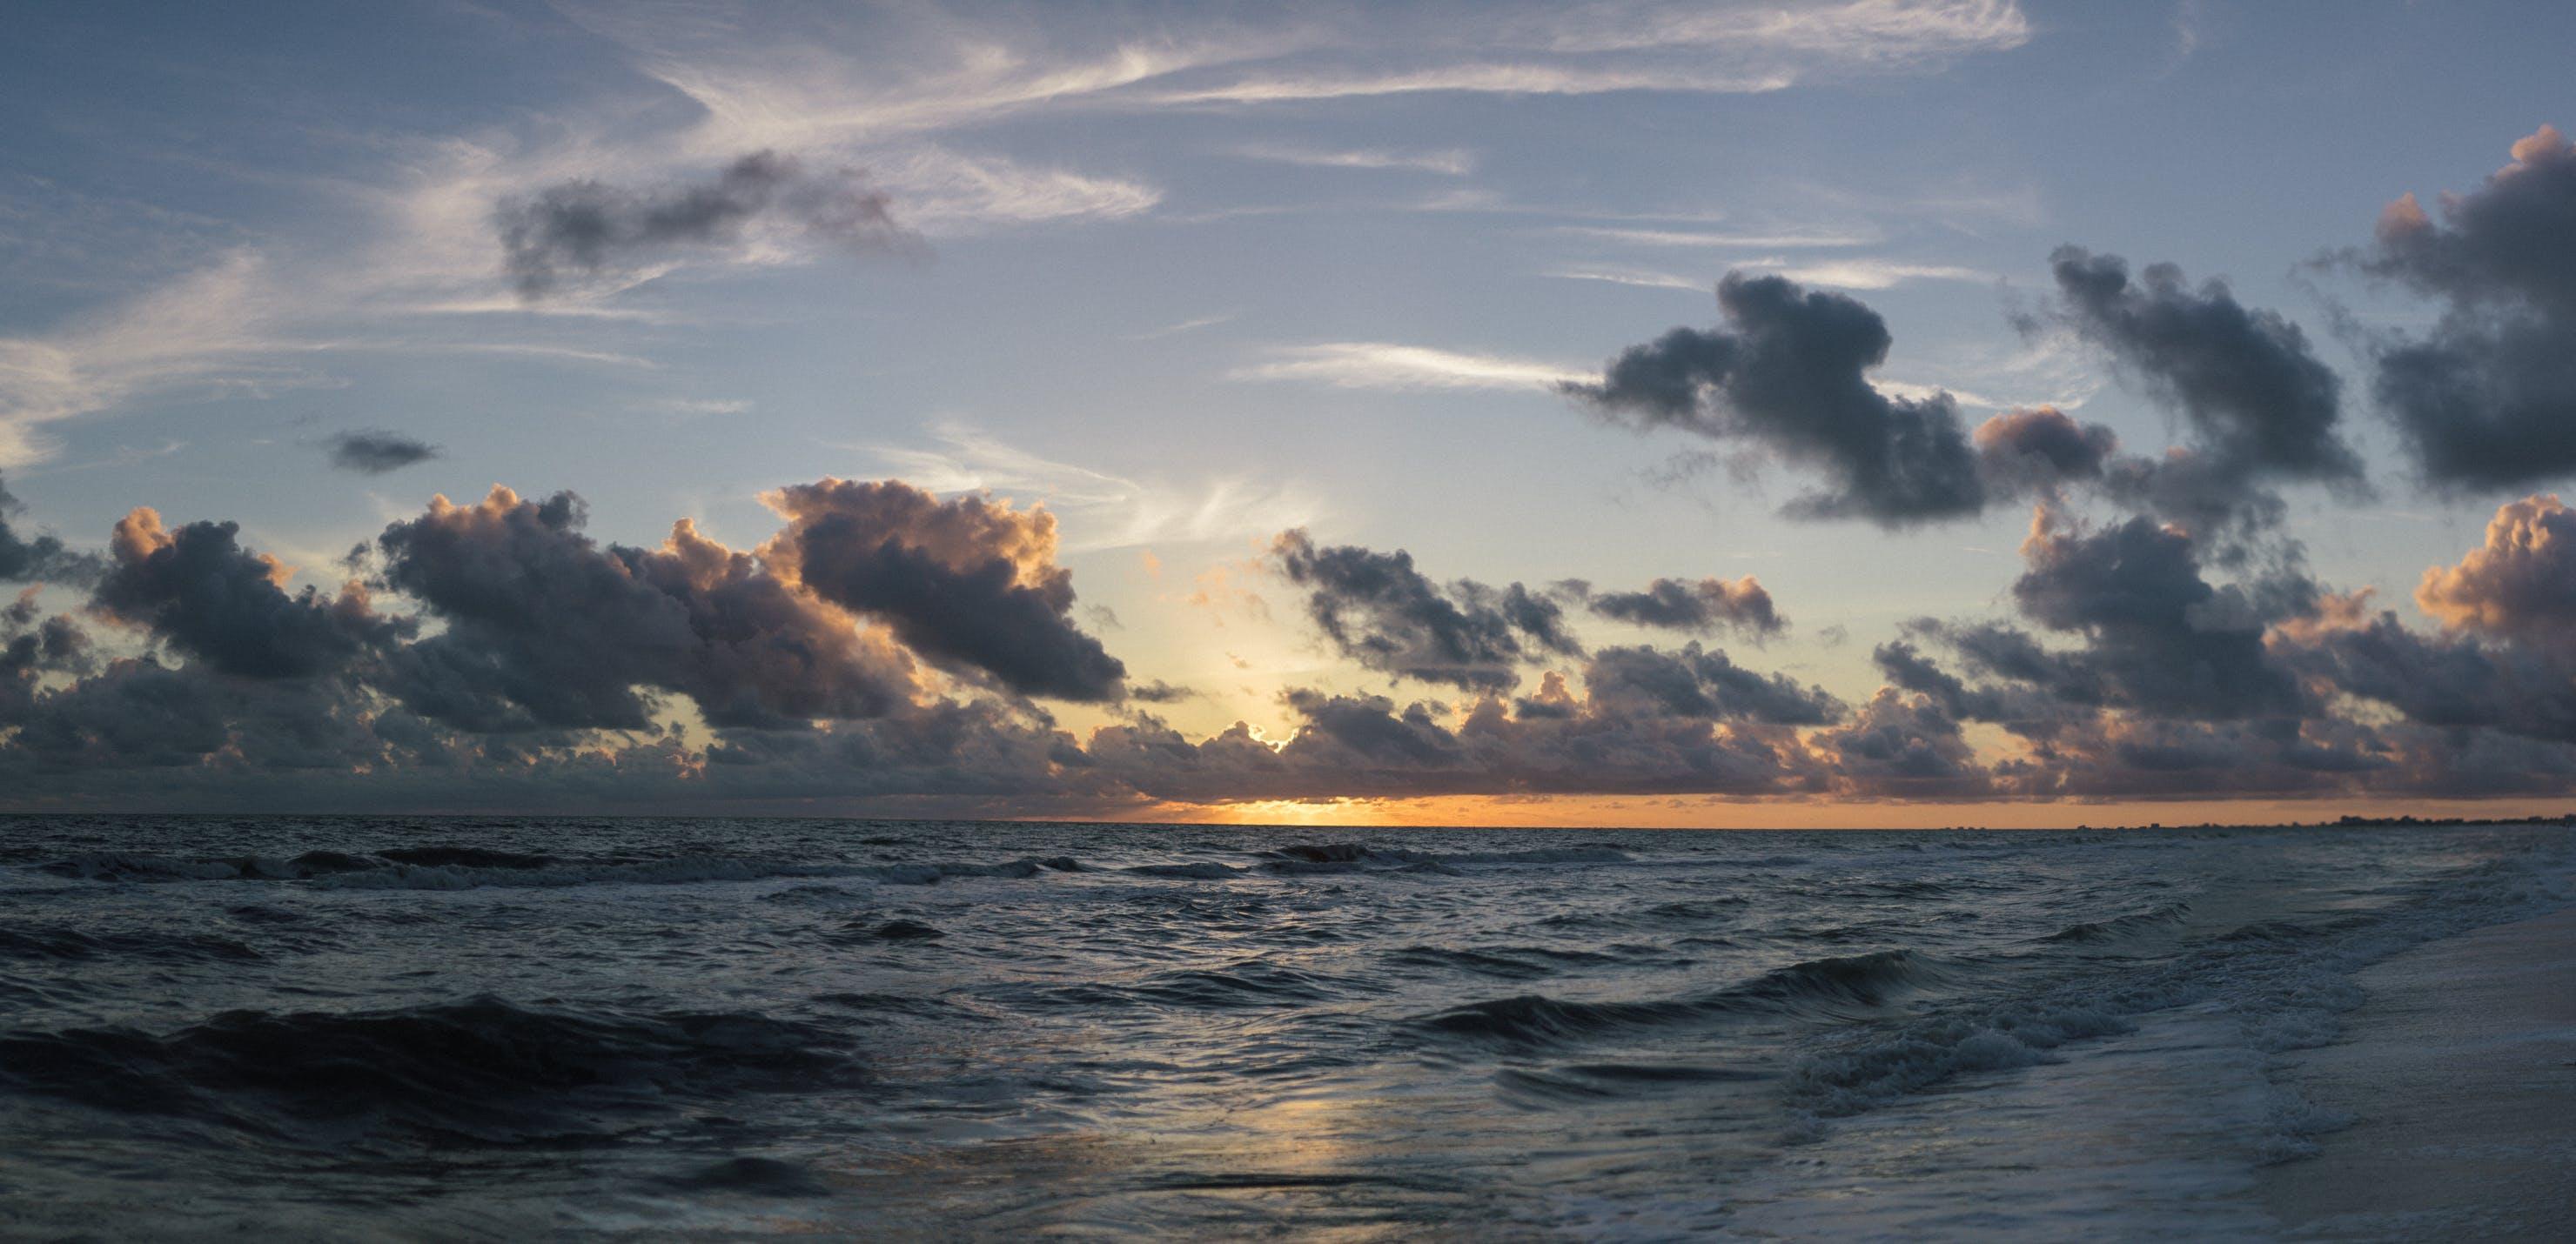 Ocean Water Under Clear Sky